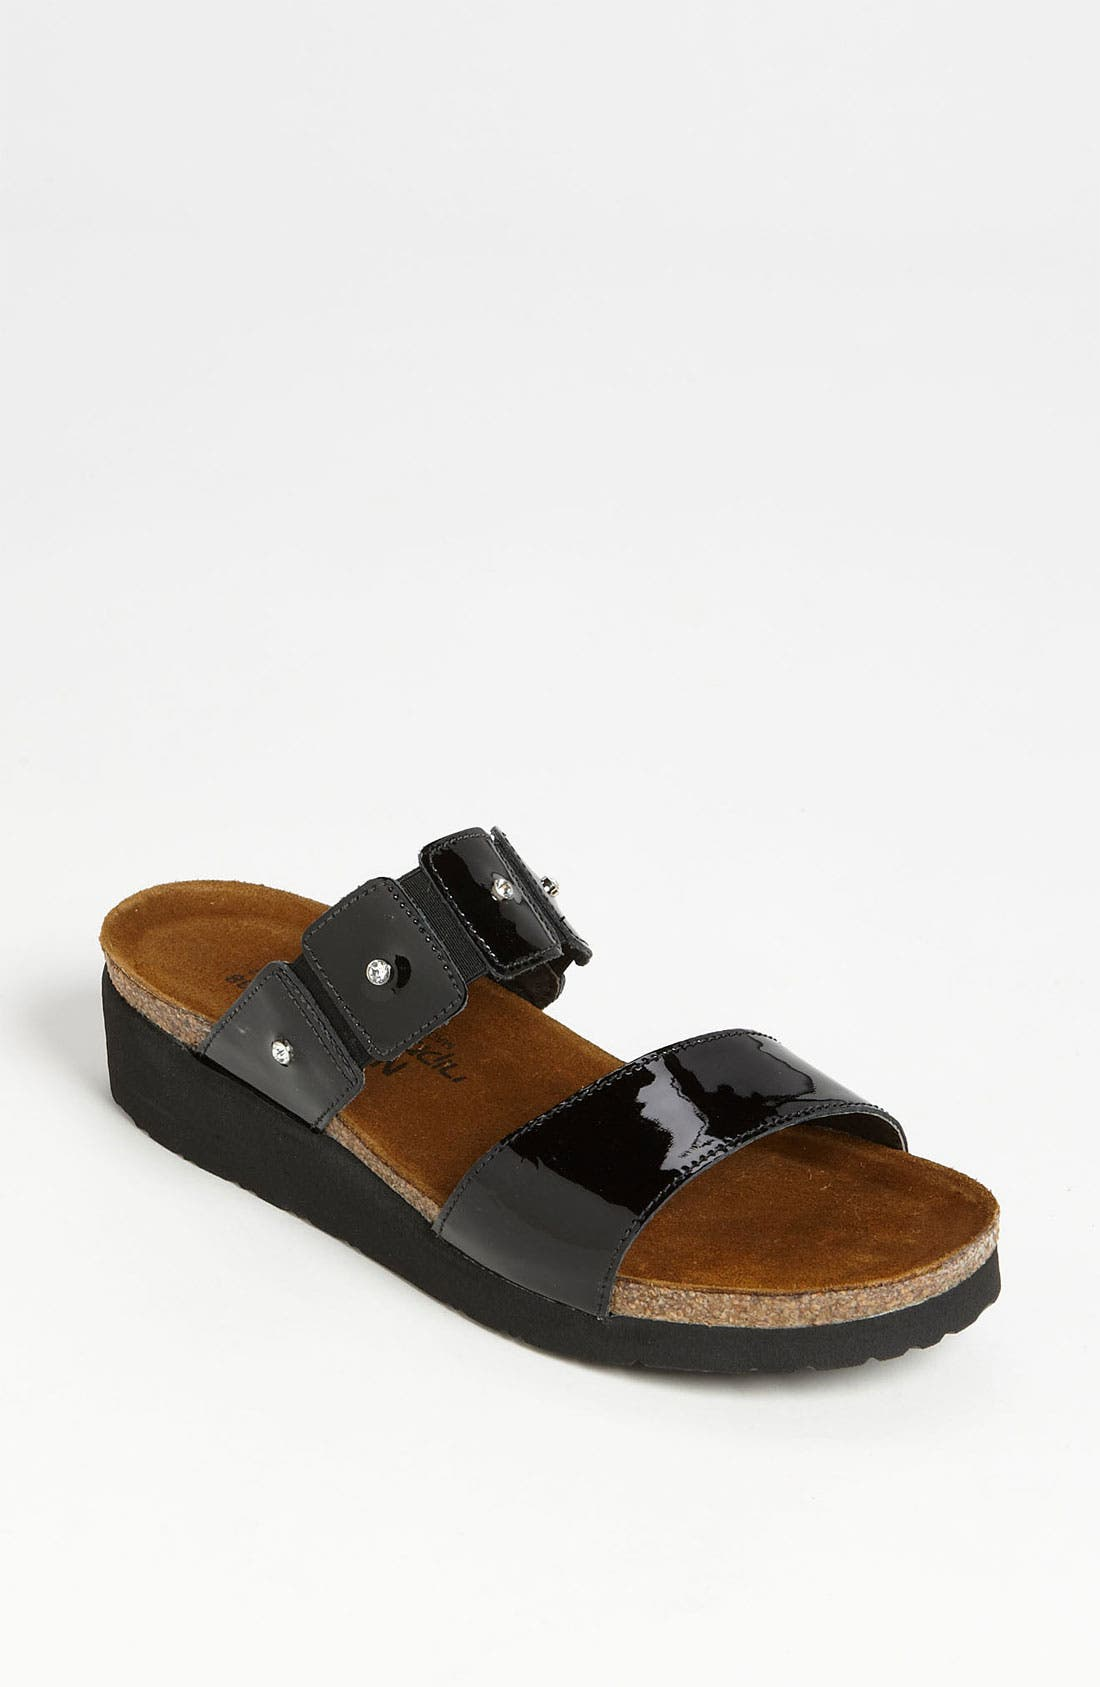 Women's Naot 'Ashley' Sandal, Size 12US - Black